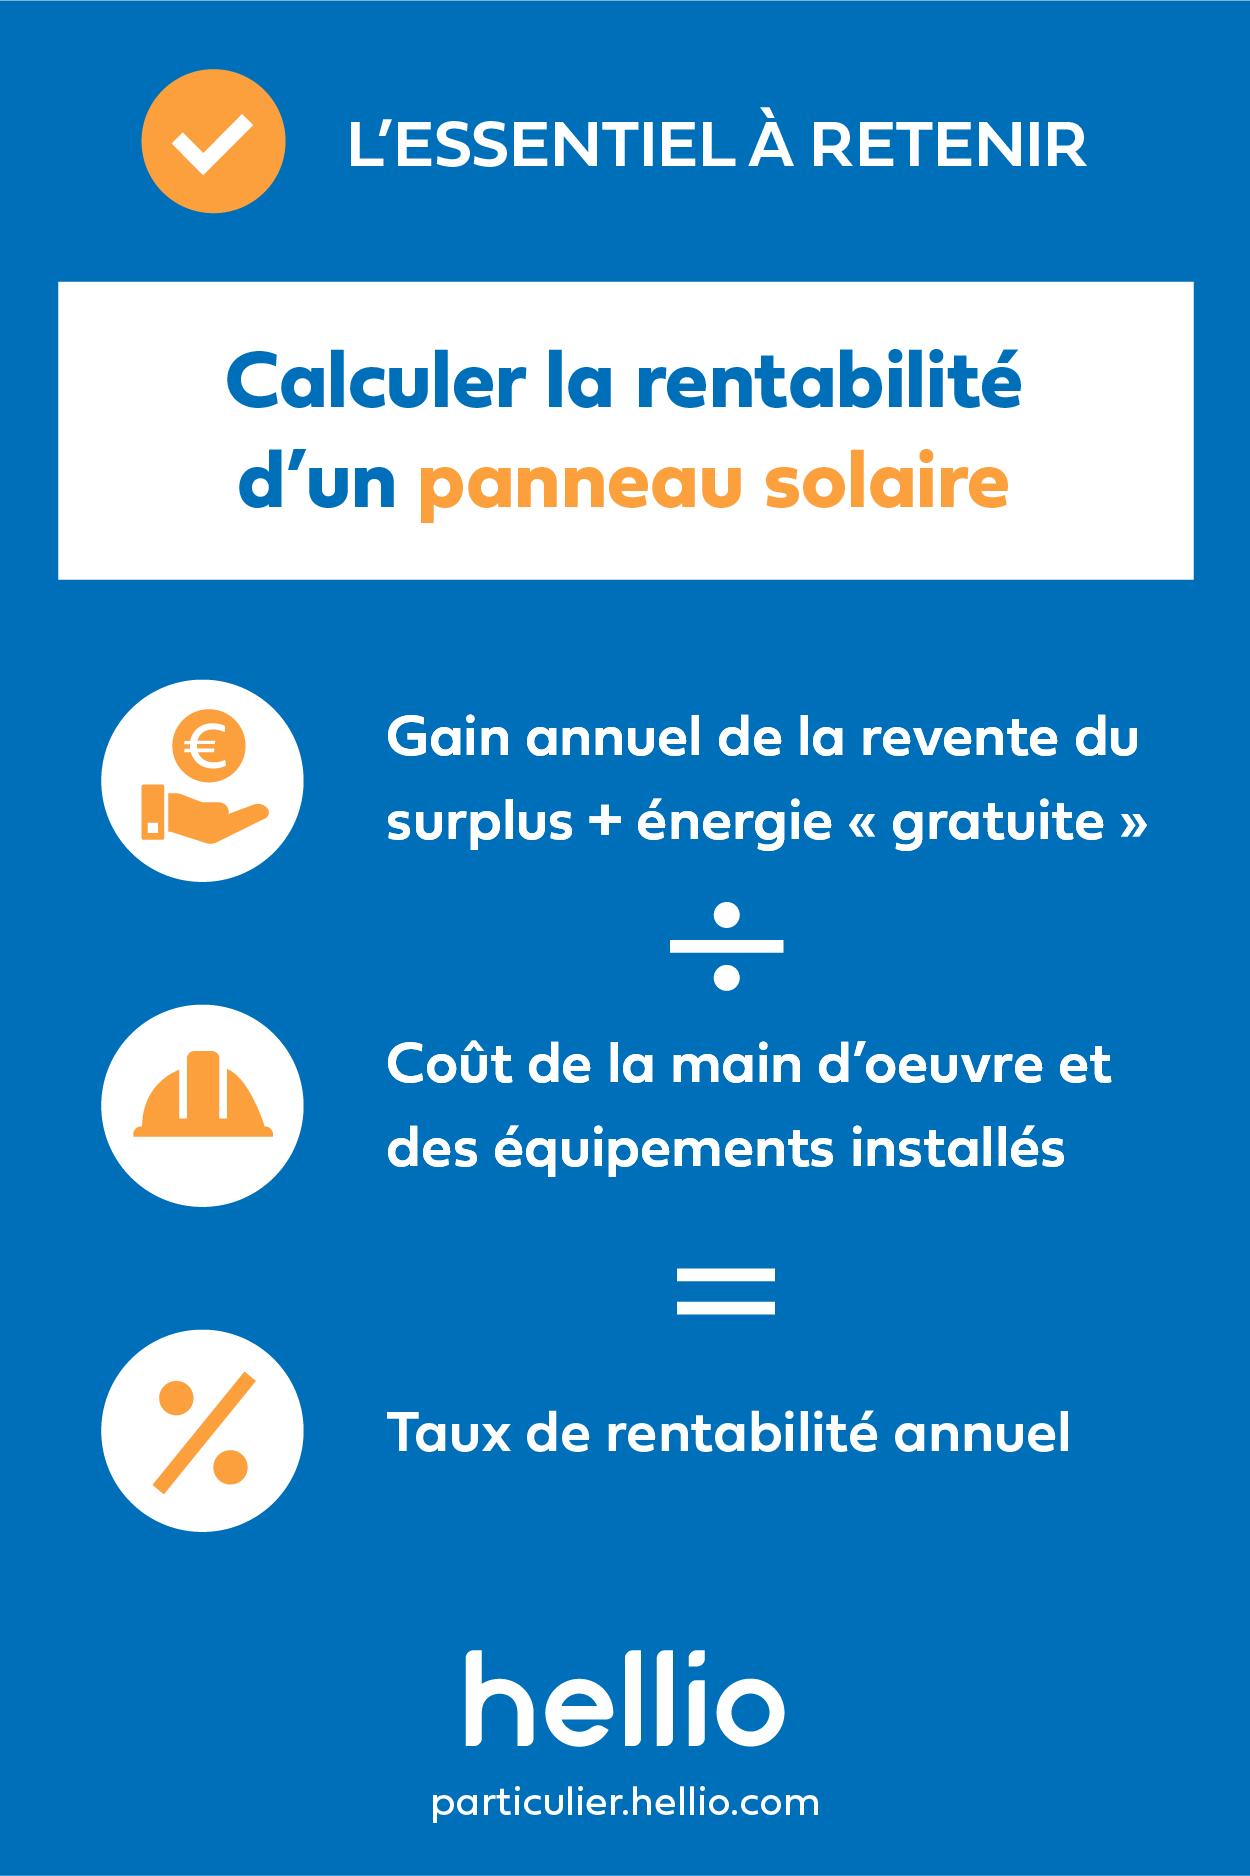 infographie-essentiel-retenir-hellio-rentabilite-panneaux-solaires